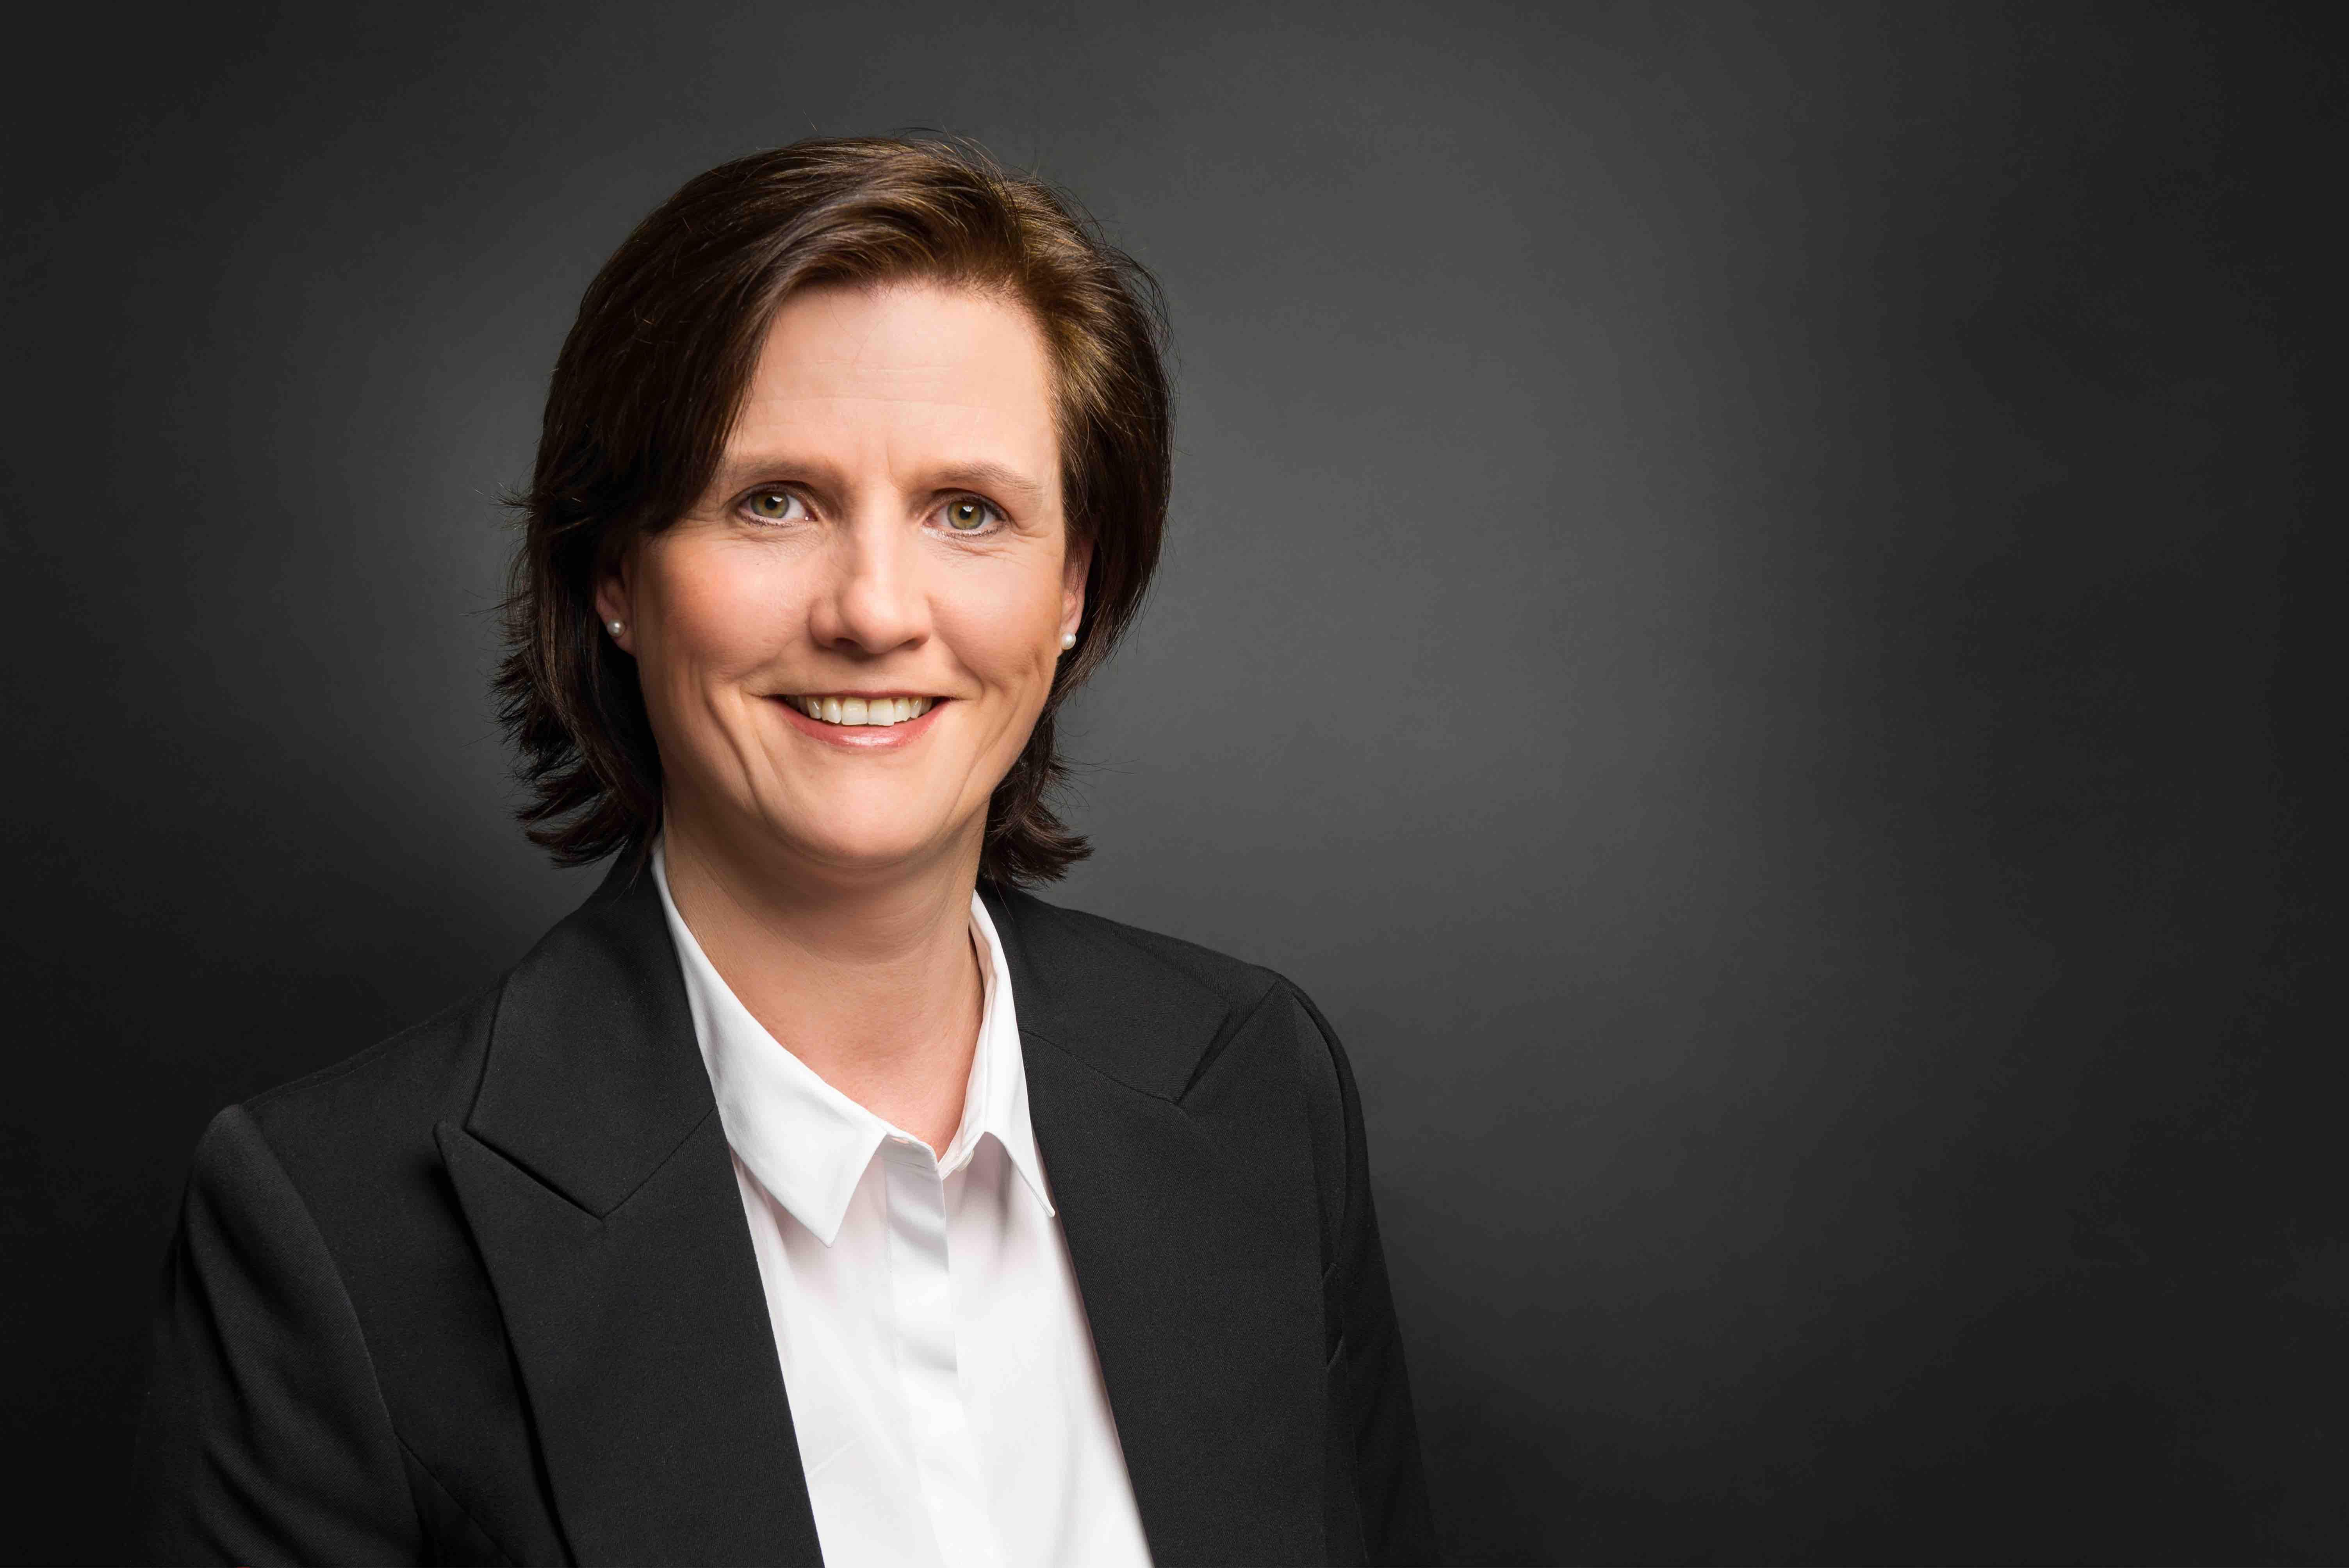 Ruth M. Huber